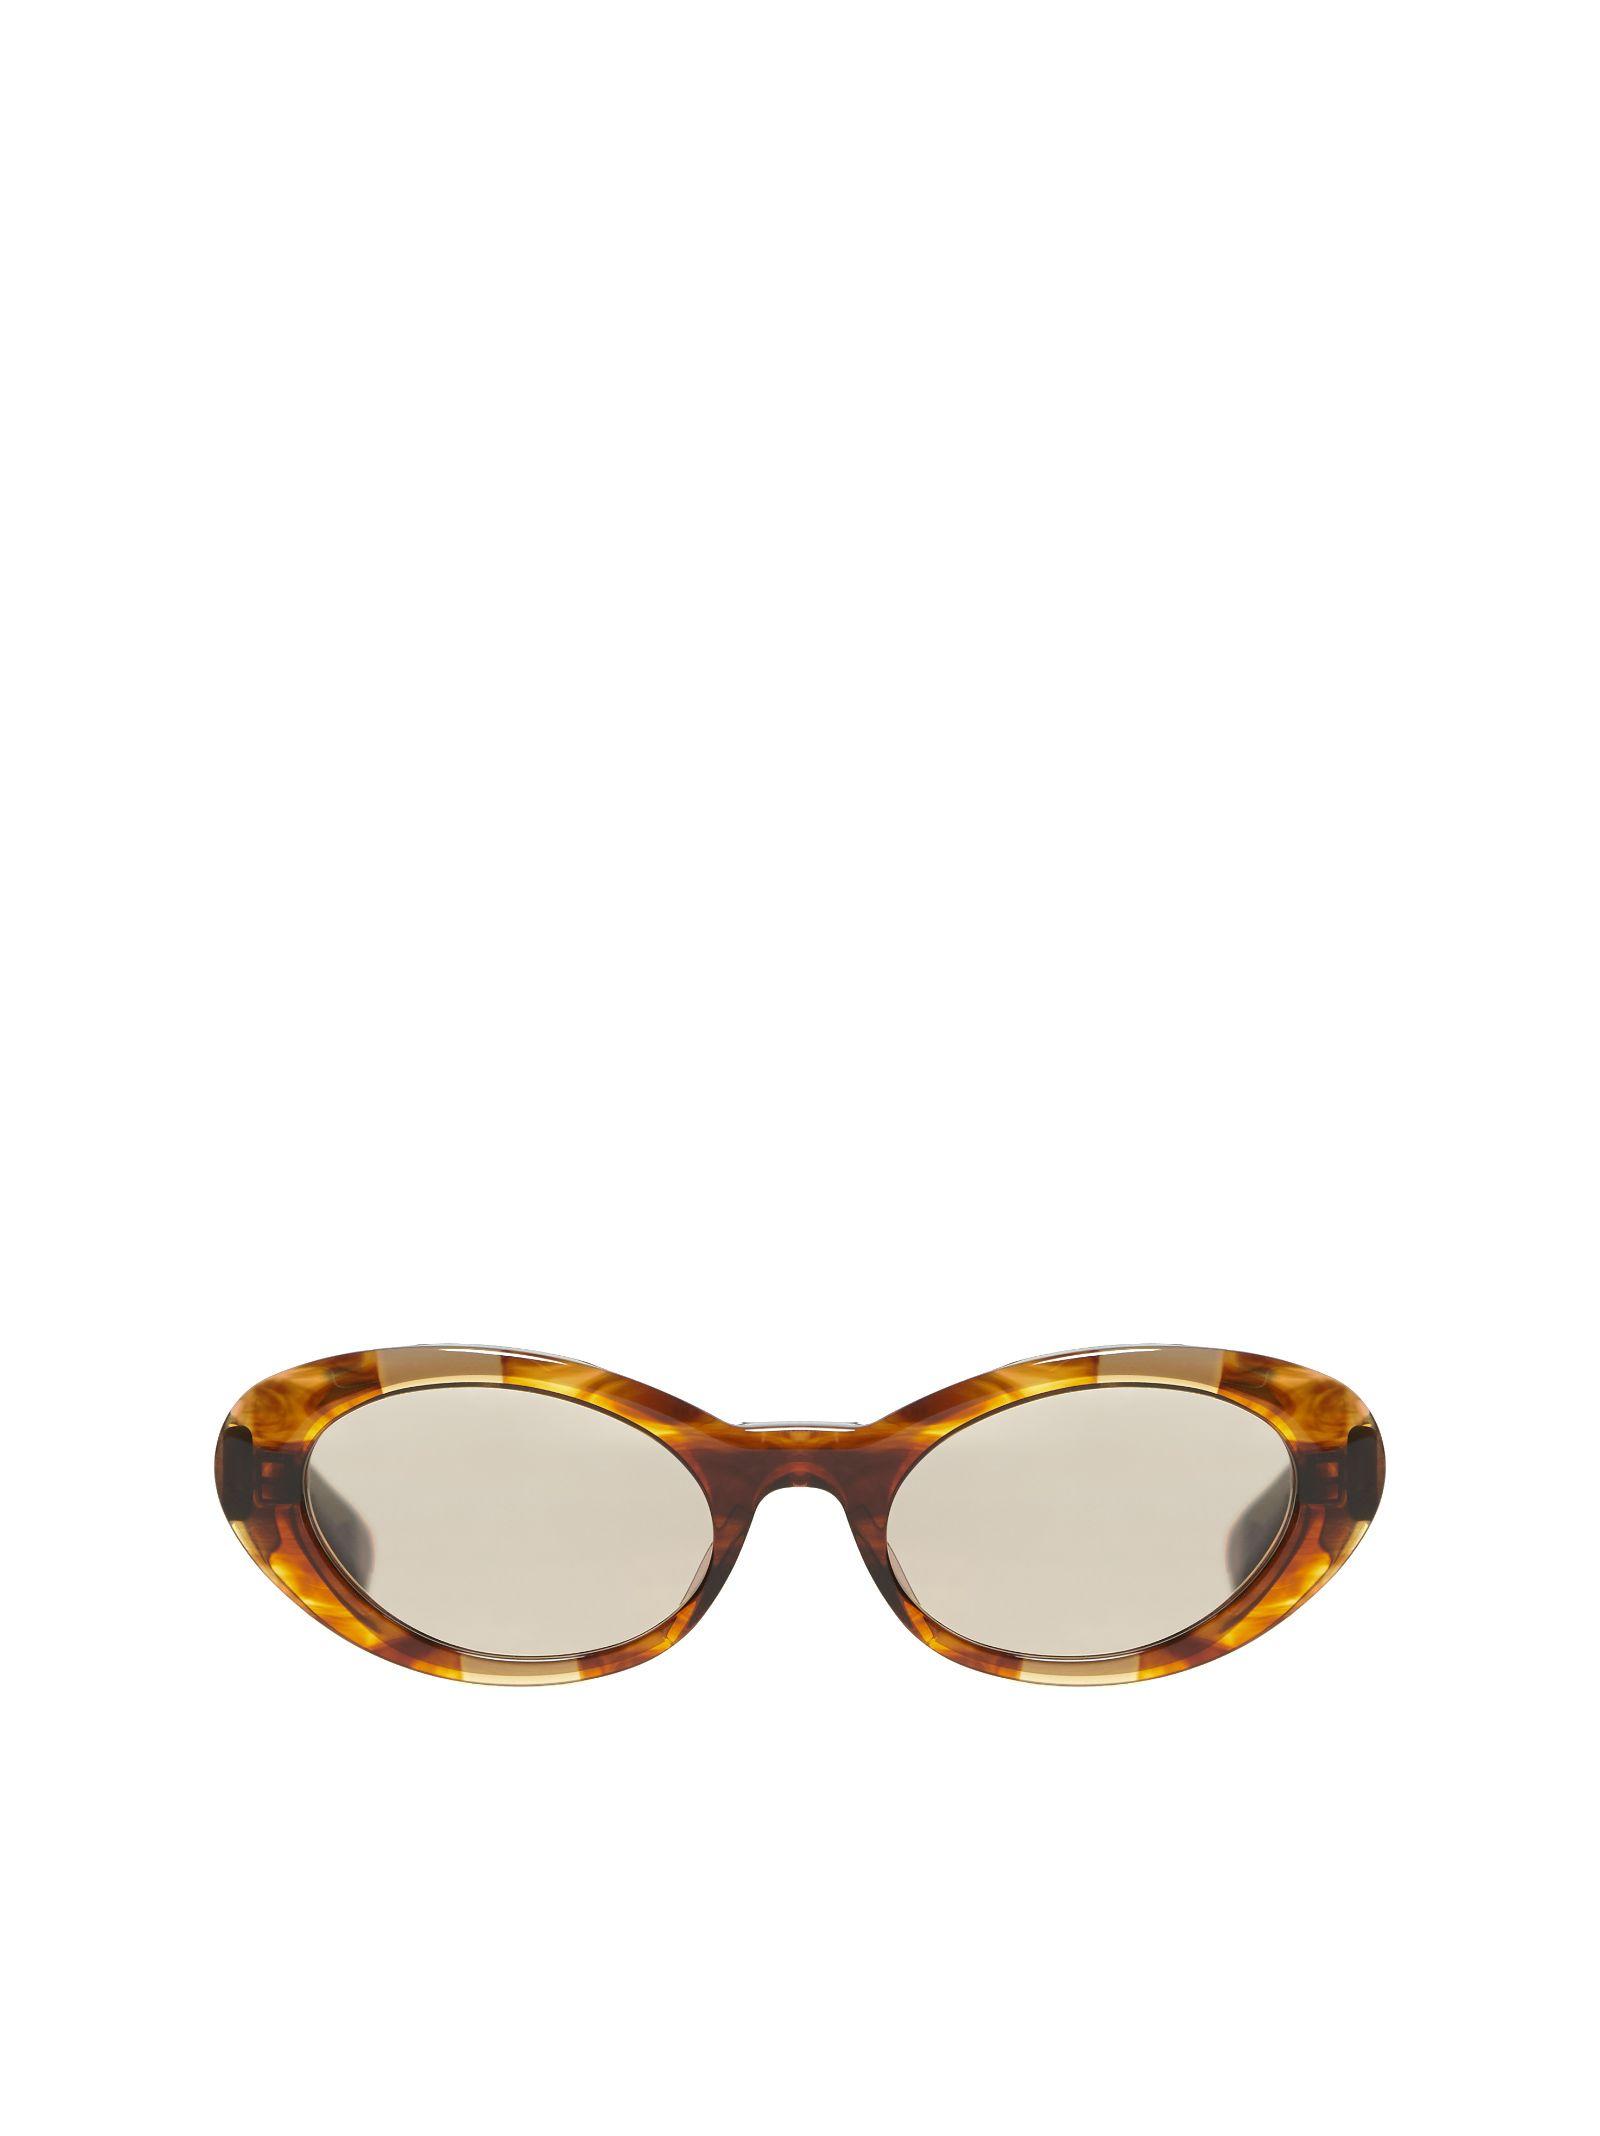 CHRISTIAN ROTH Cat Eye Sunglasses in Marrone